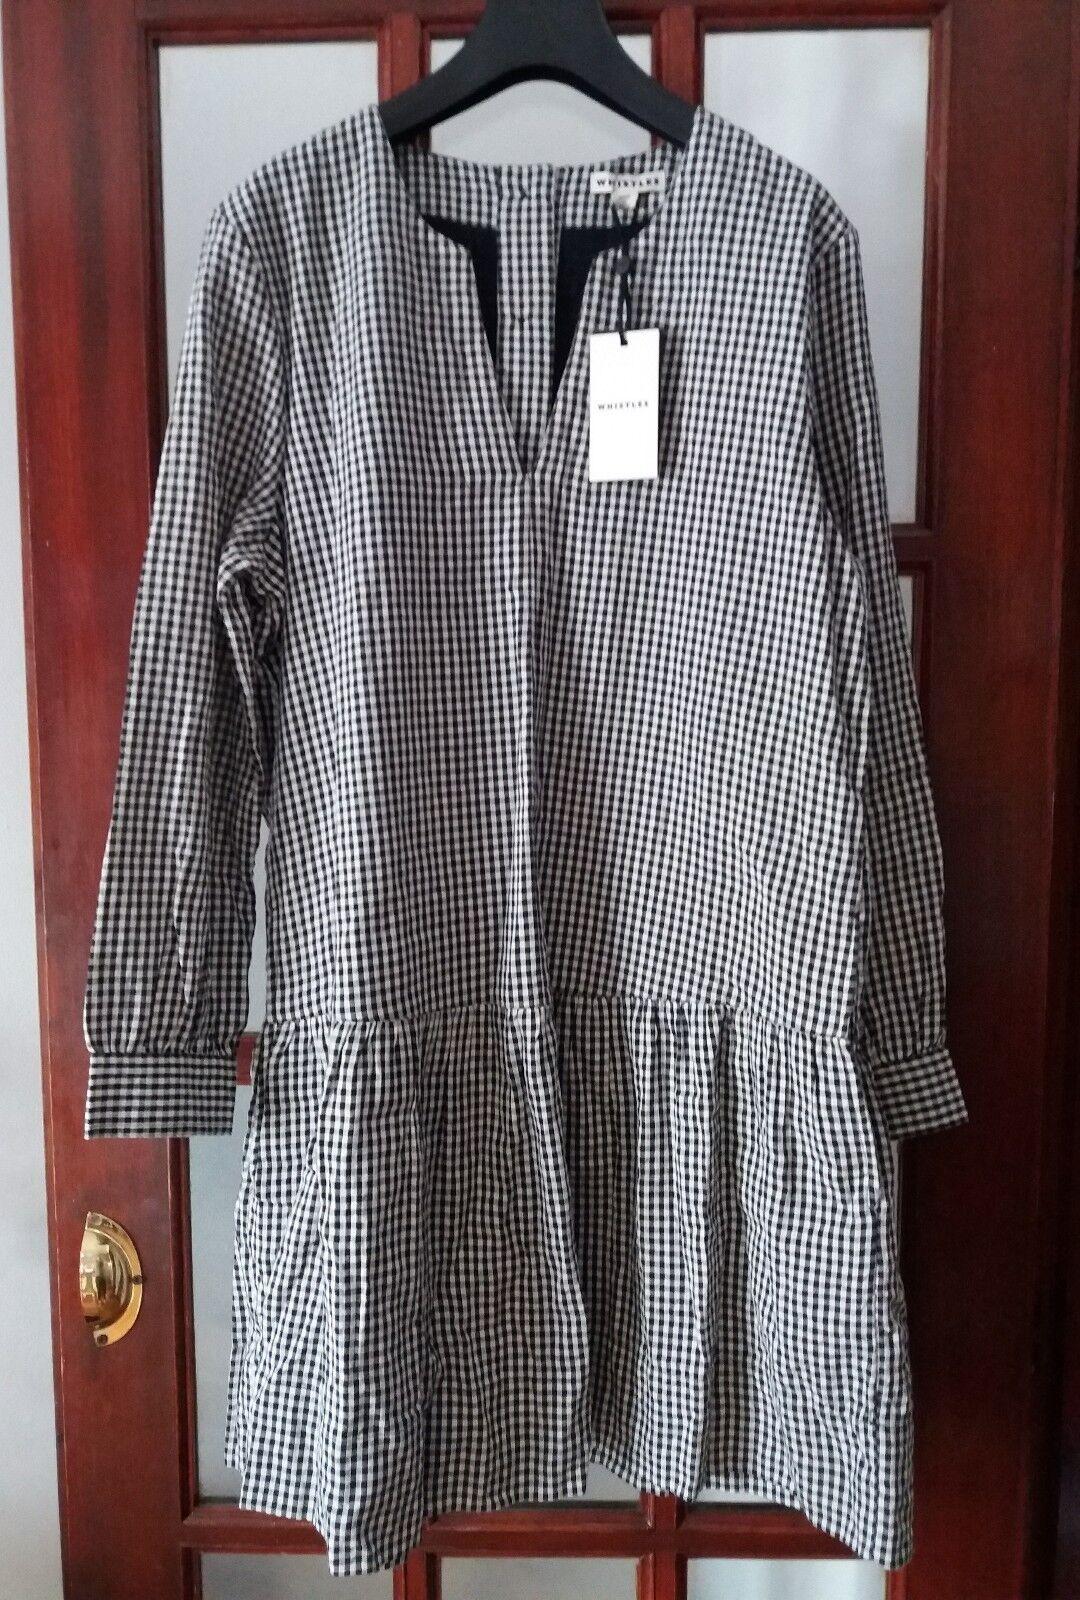 BNWT Whistles Dropped Hem Gingham Cotton Dress UK12 14 rrp